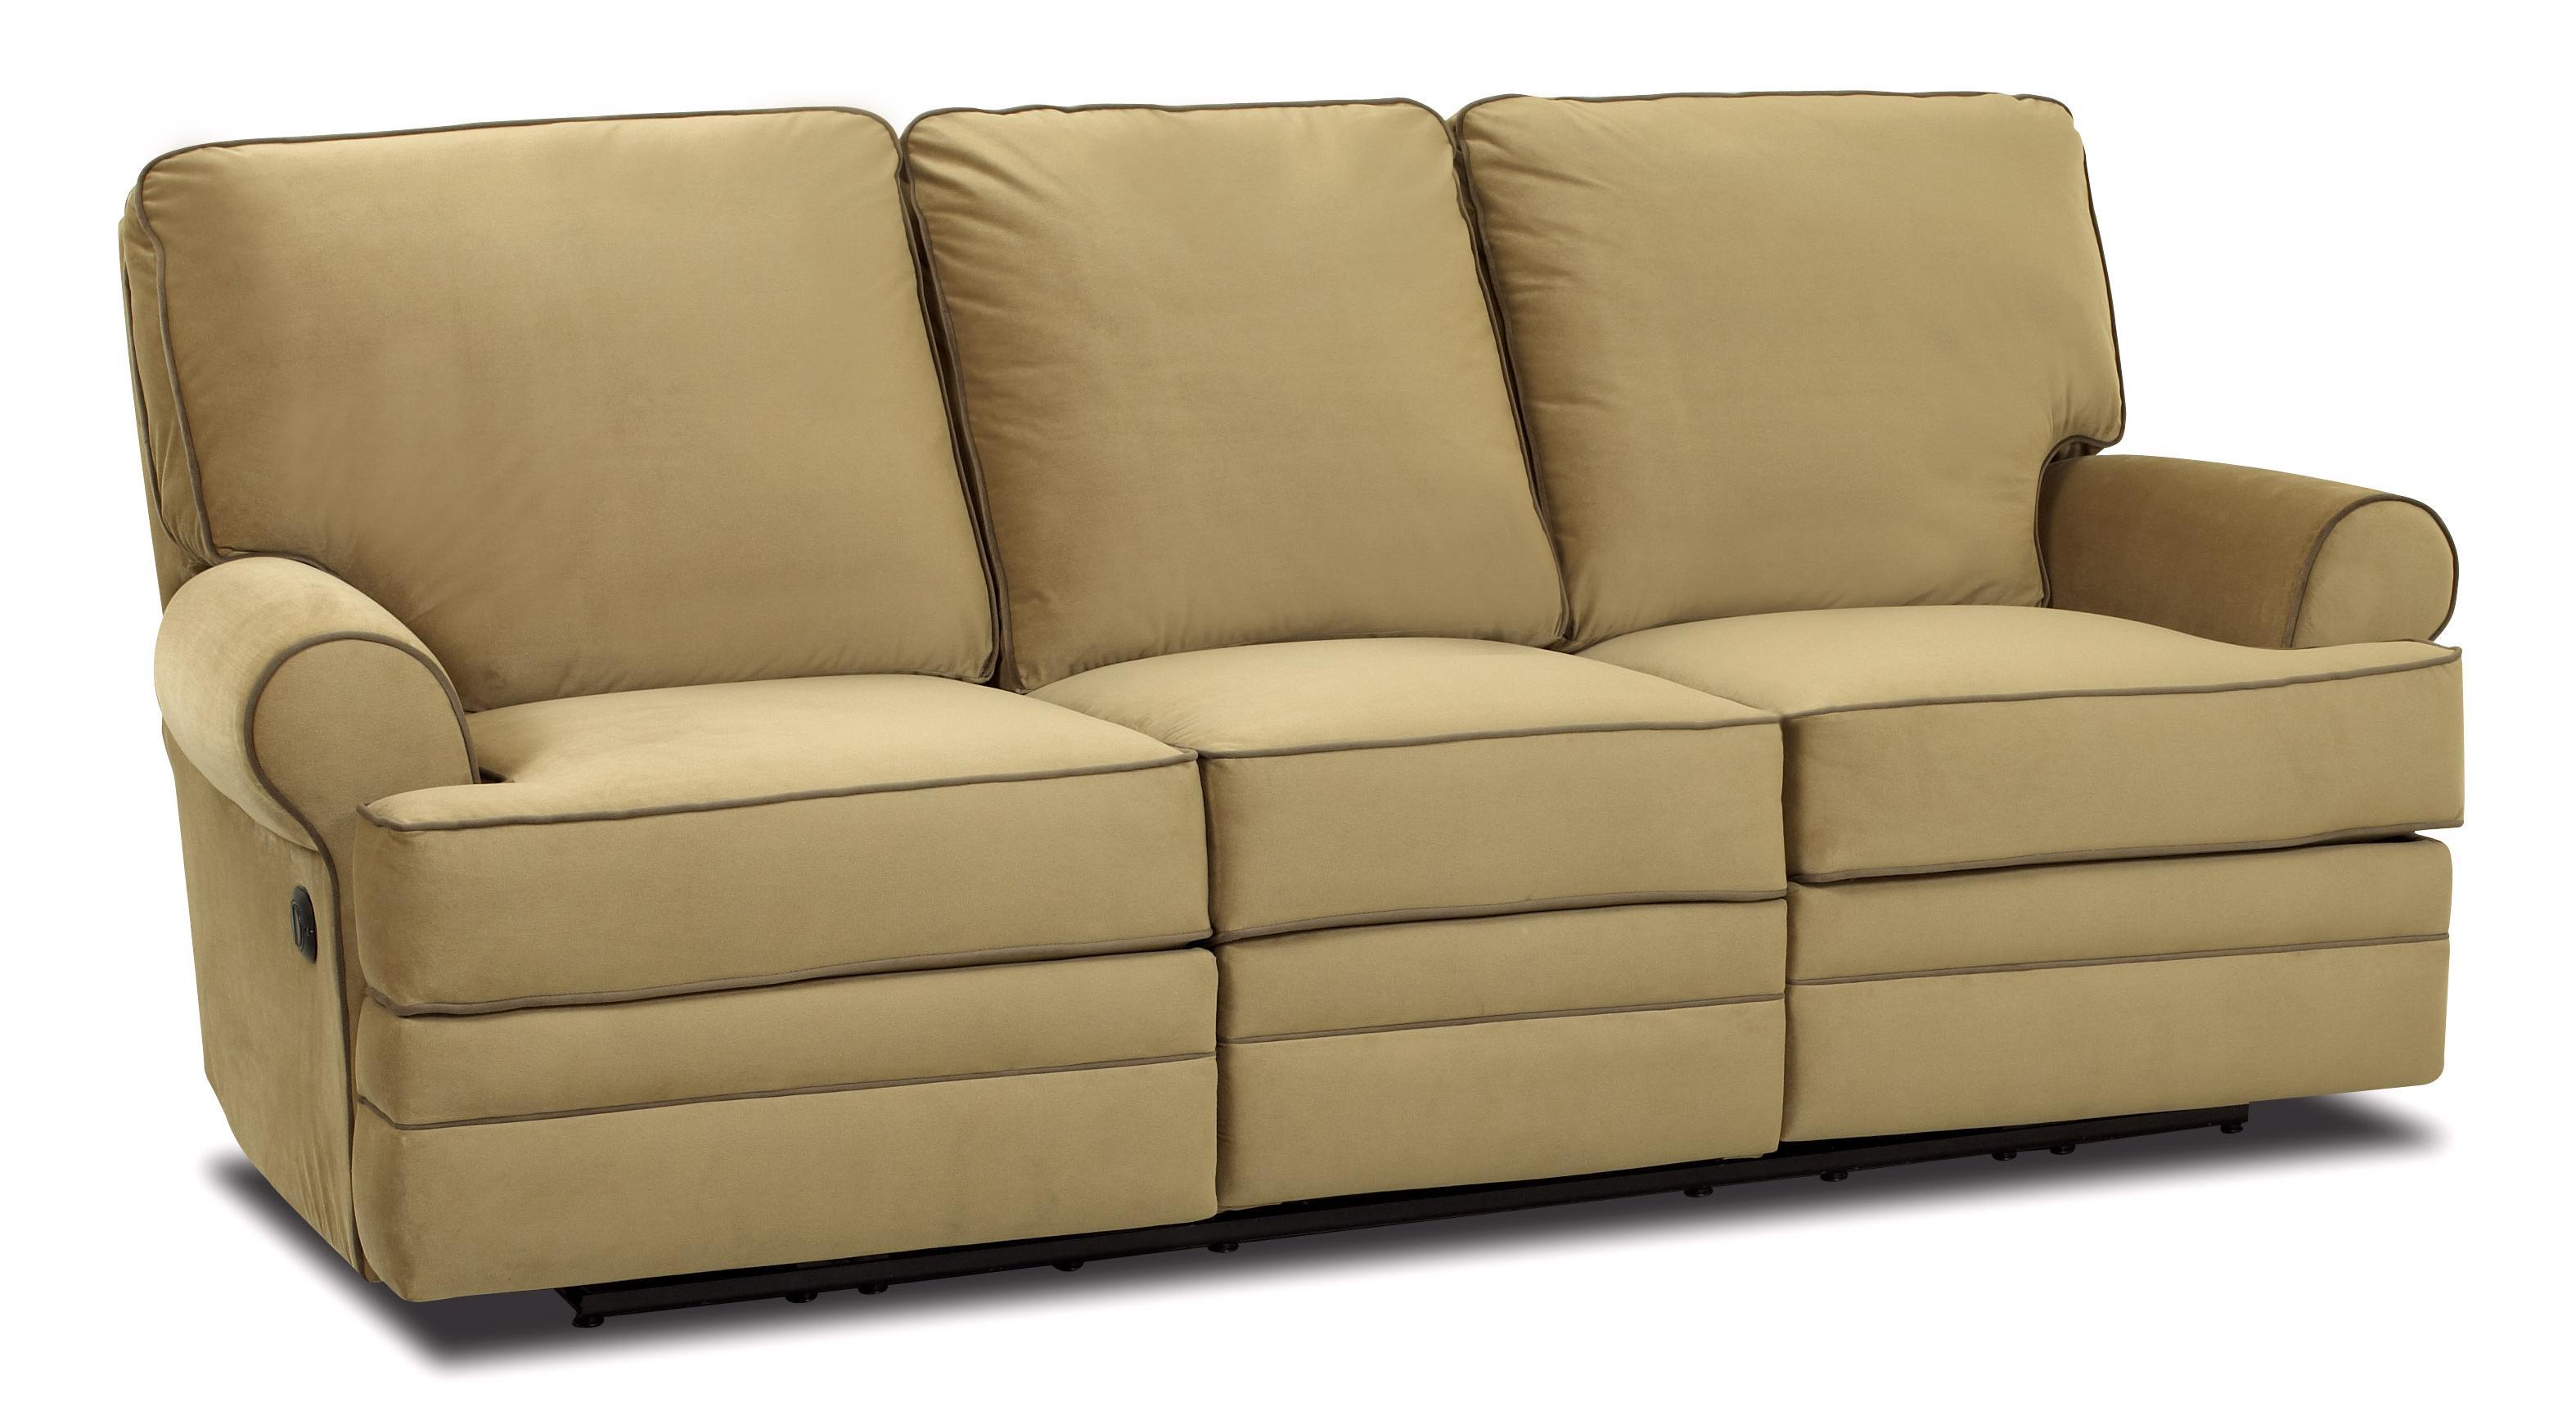 Klaussner Belleview Power Dual Reclining Sofa Darvin